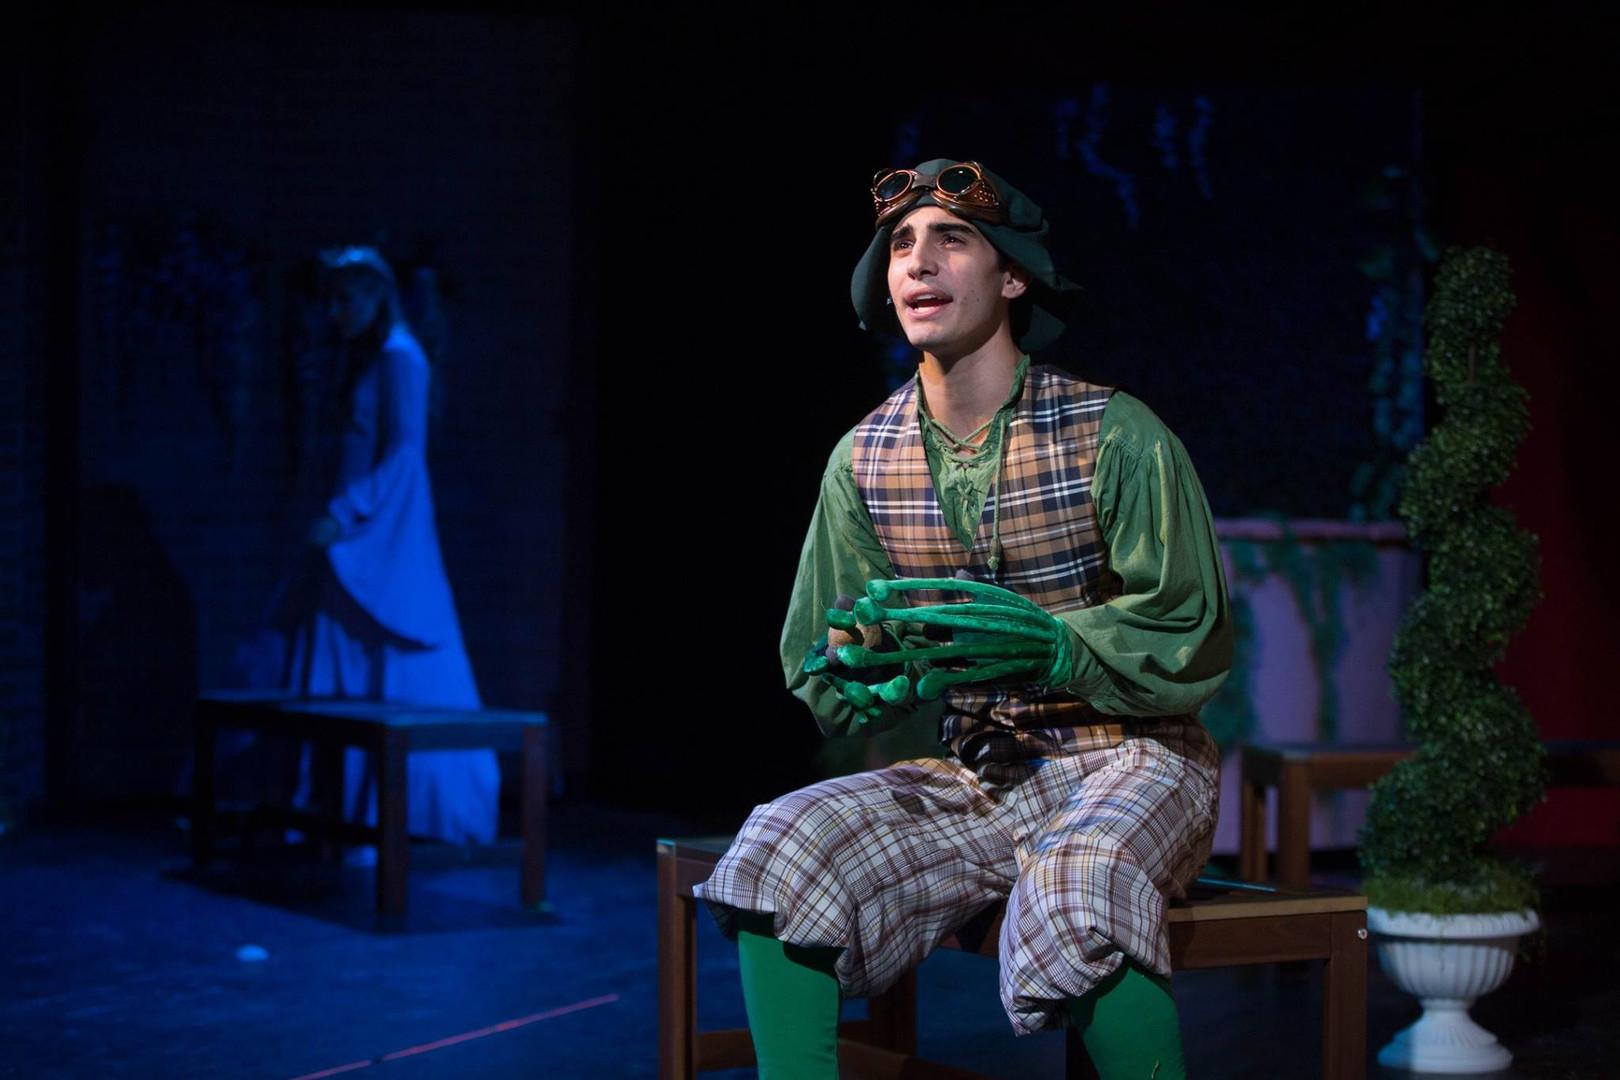 Salvatore Vieiera as Croaker, Three Act Theatre Company.  Photo by Micah Jay Photography.